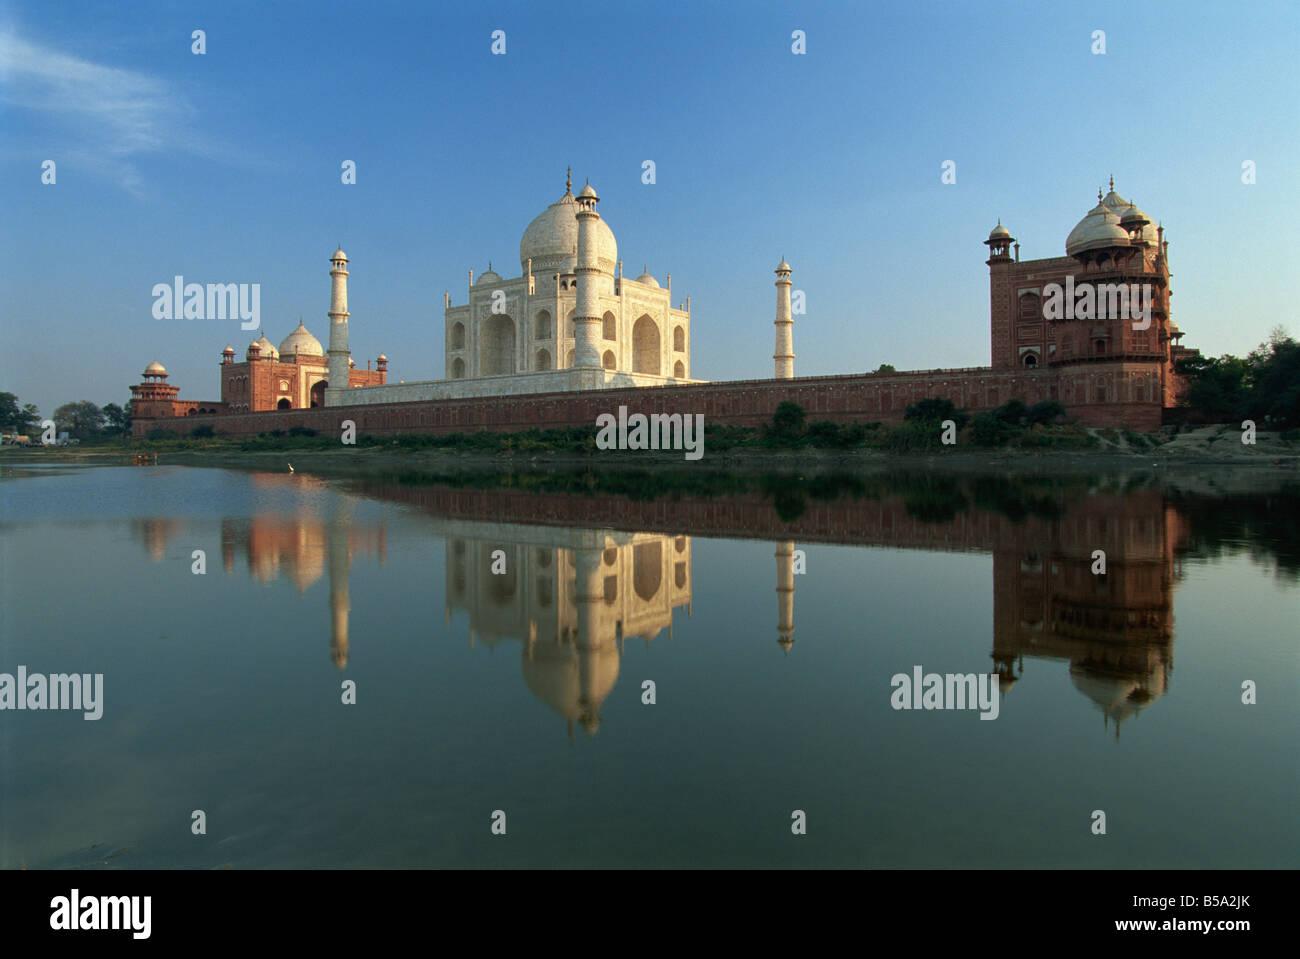 Taj Mahal UNESCO World Heritage Site Agra Uttar Pradesh state India Asia - Stock Image